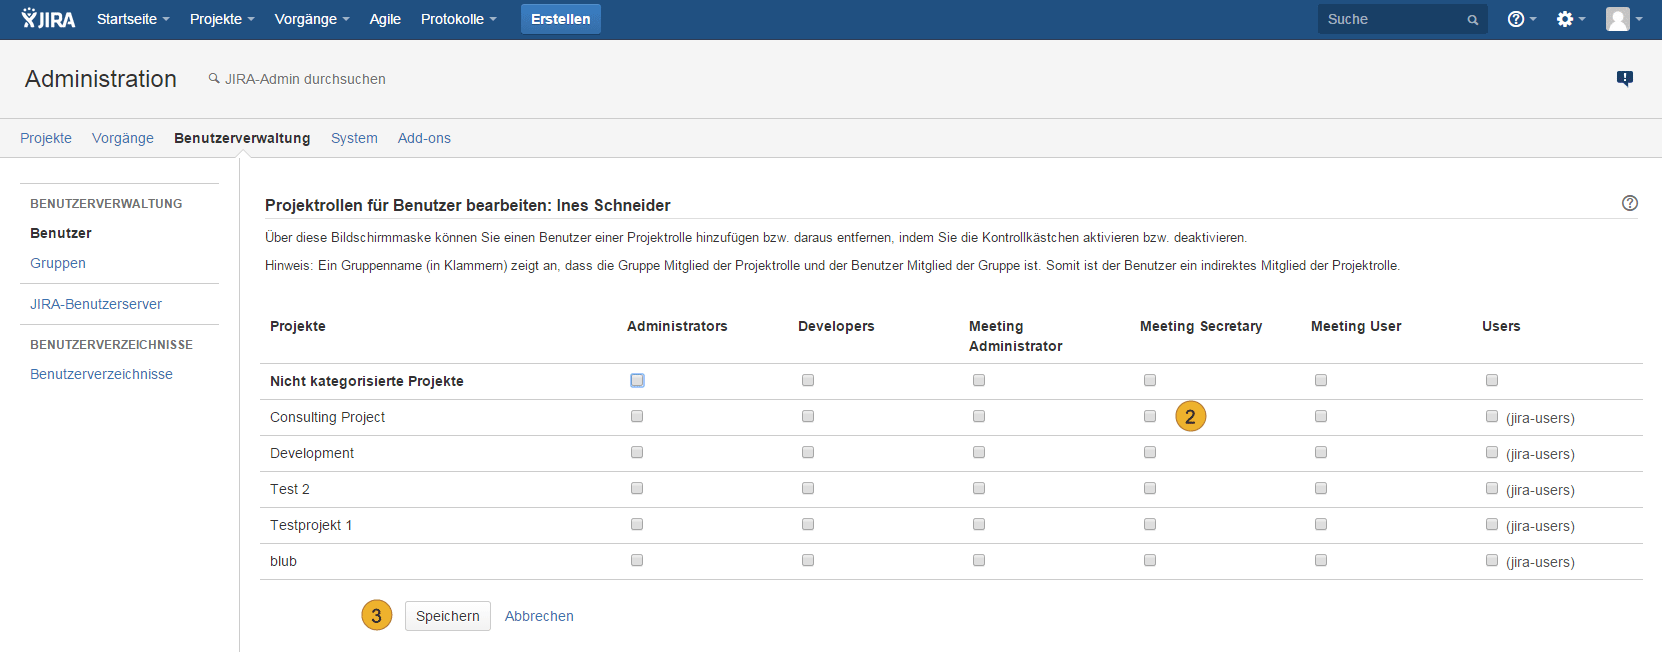 Atlassian JIRA - Benutzerverwaltung - Projektrollen für Benutzer bearbeiten - AgileMinutes Rechte - Meeting Secretary, Meeting Administrator, Meeting User